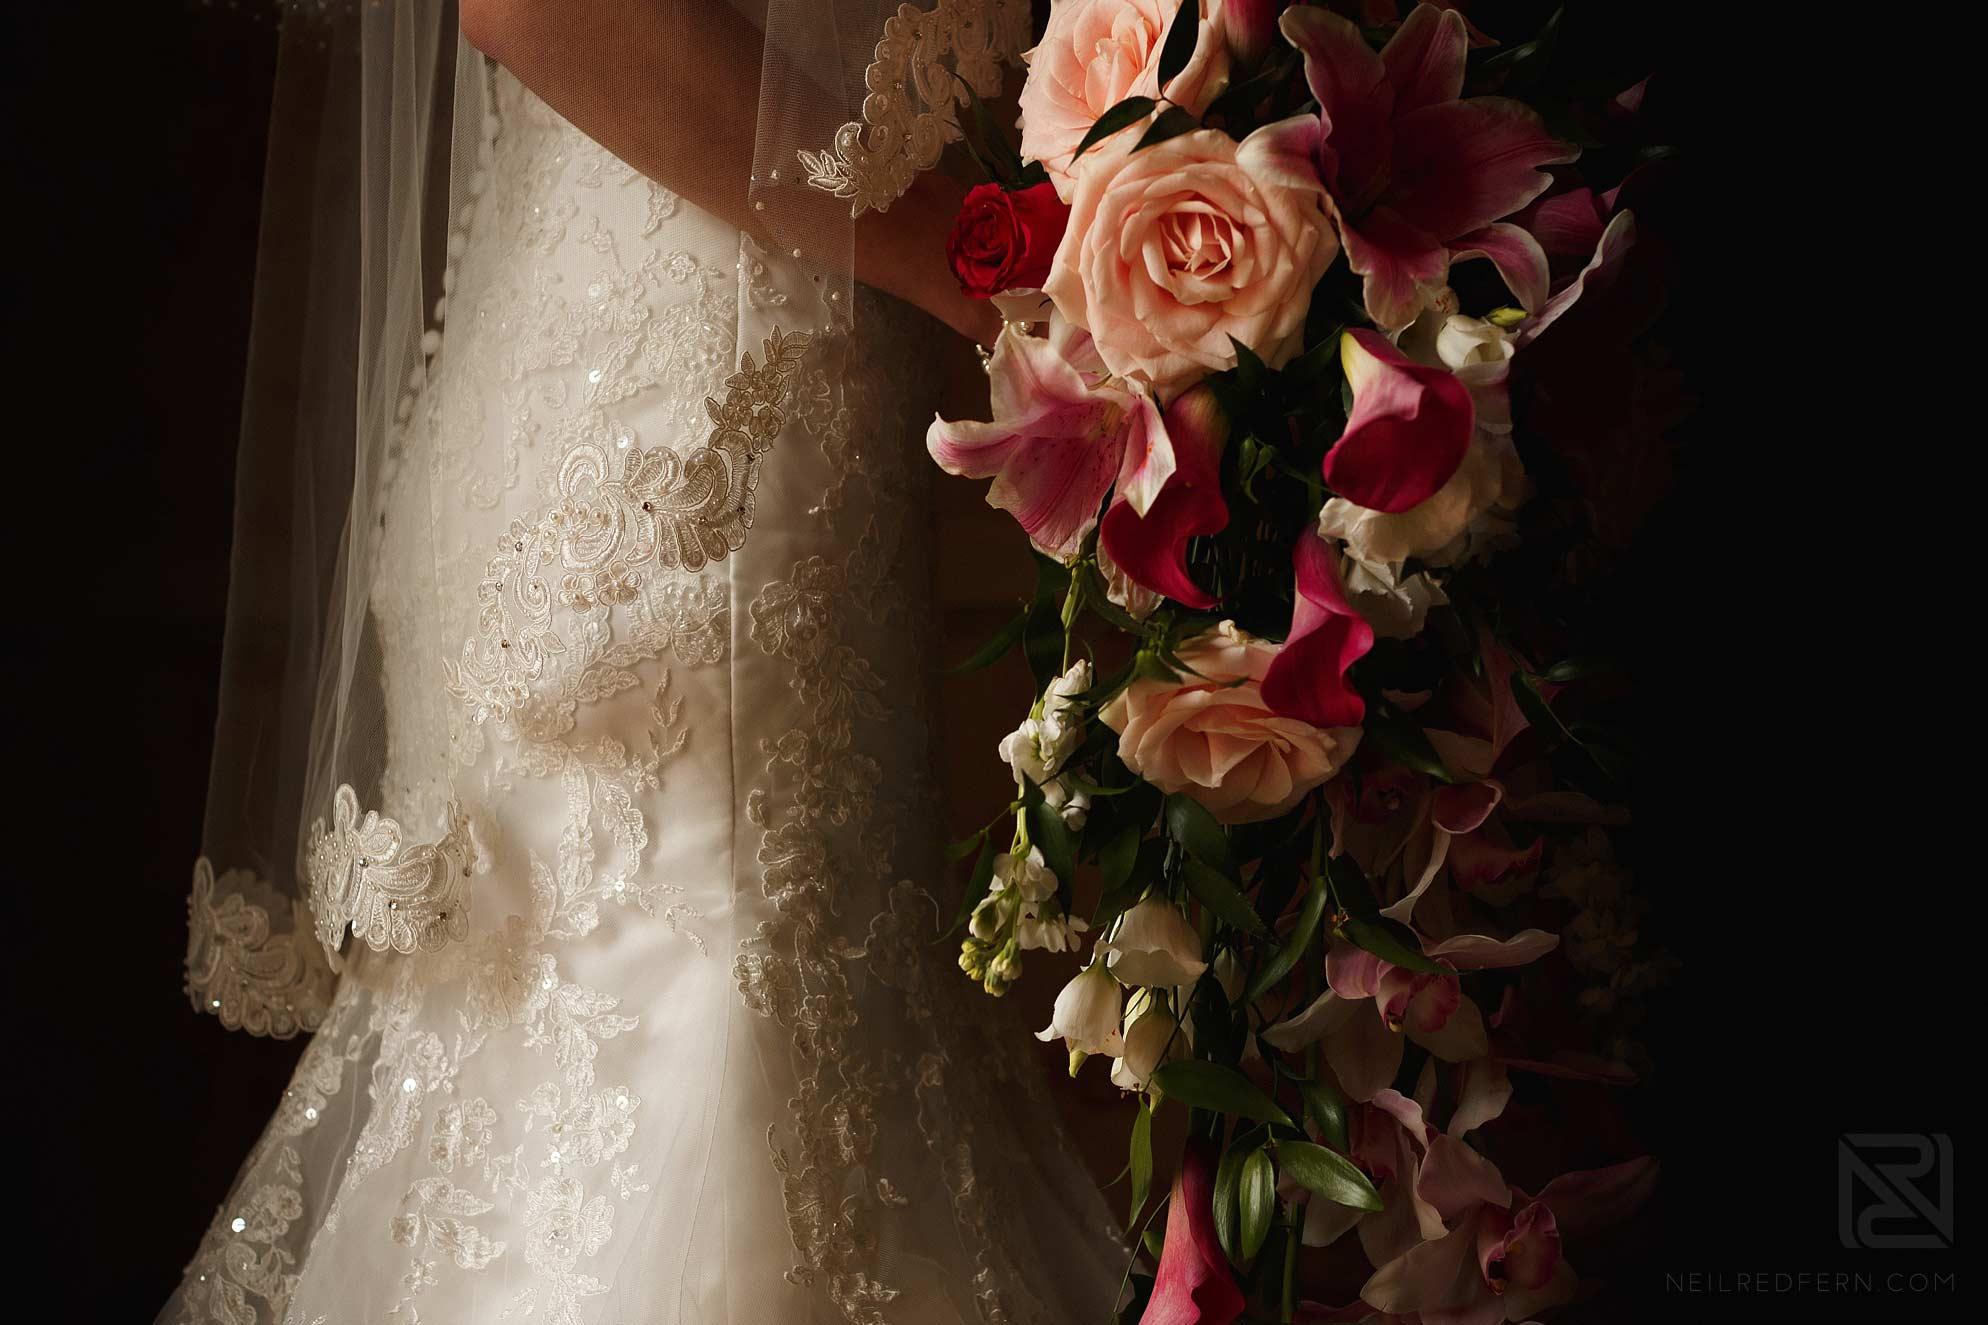 Metropole-Hotel-Llandrindod-Wells-wedding-16